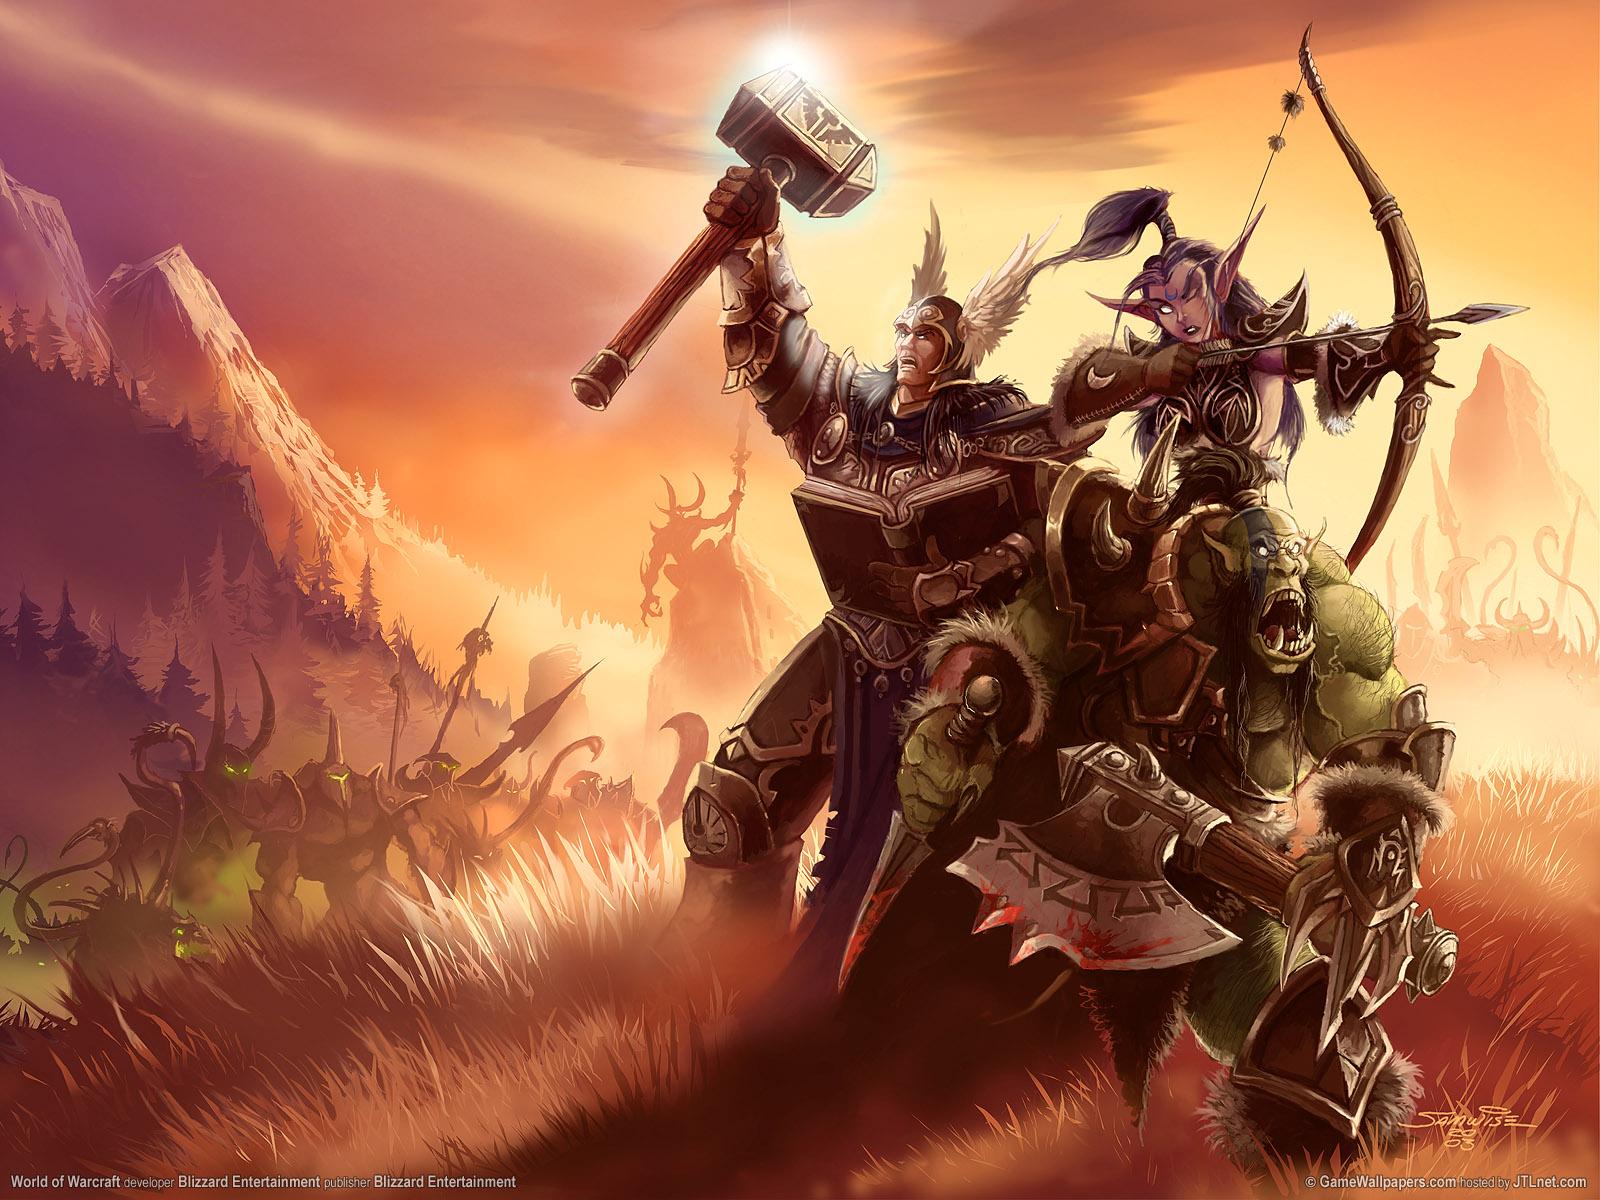 wallpaper world of warcraft 150x150 1600x1200